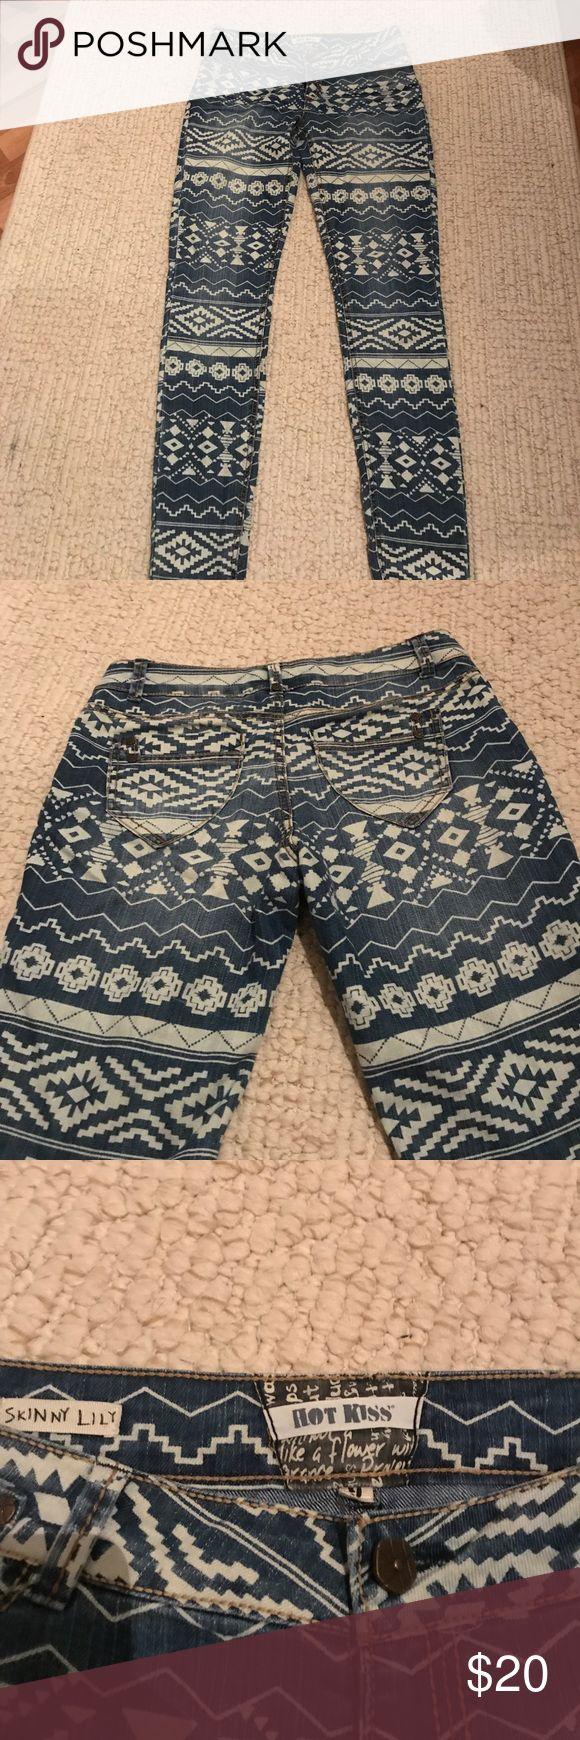 Aztec Jeans Hot Kiss Skinny Lily Size 9 Aztec Jeans- Never Worn Hot Kiss Jeans Skinny